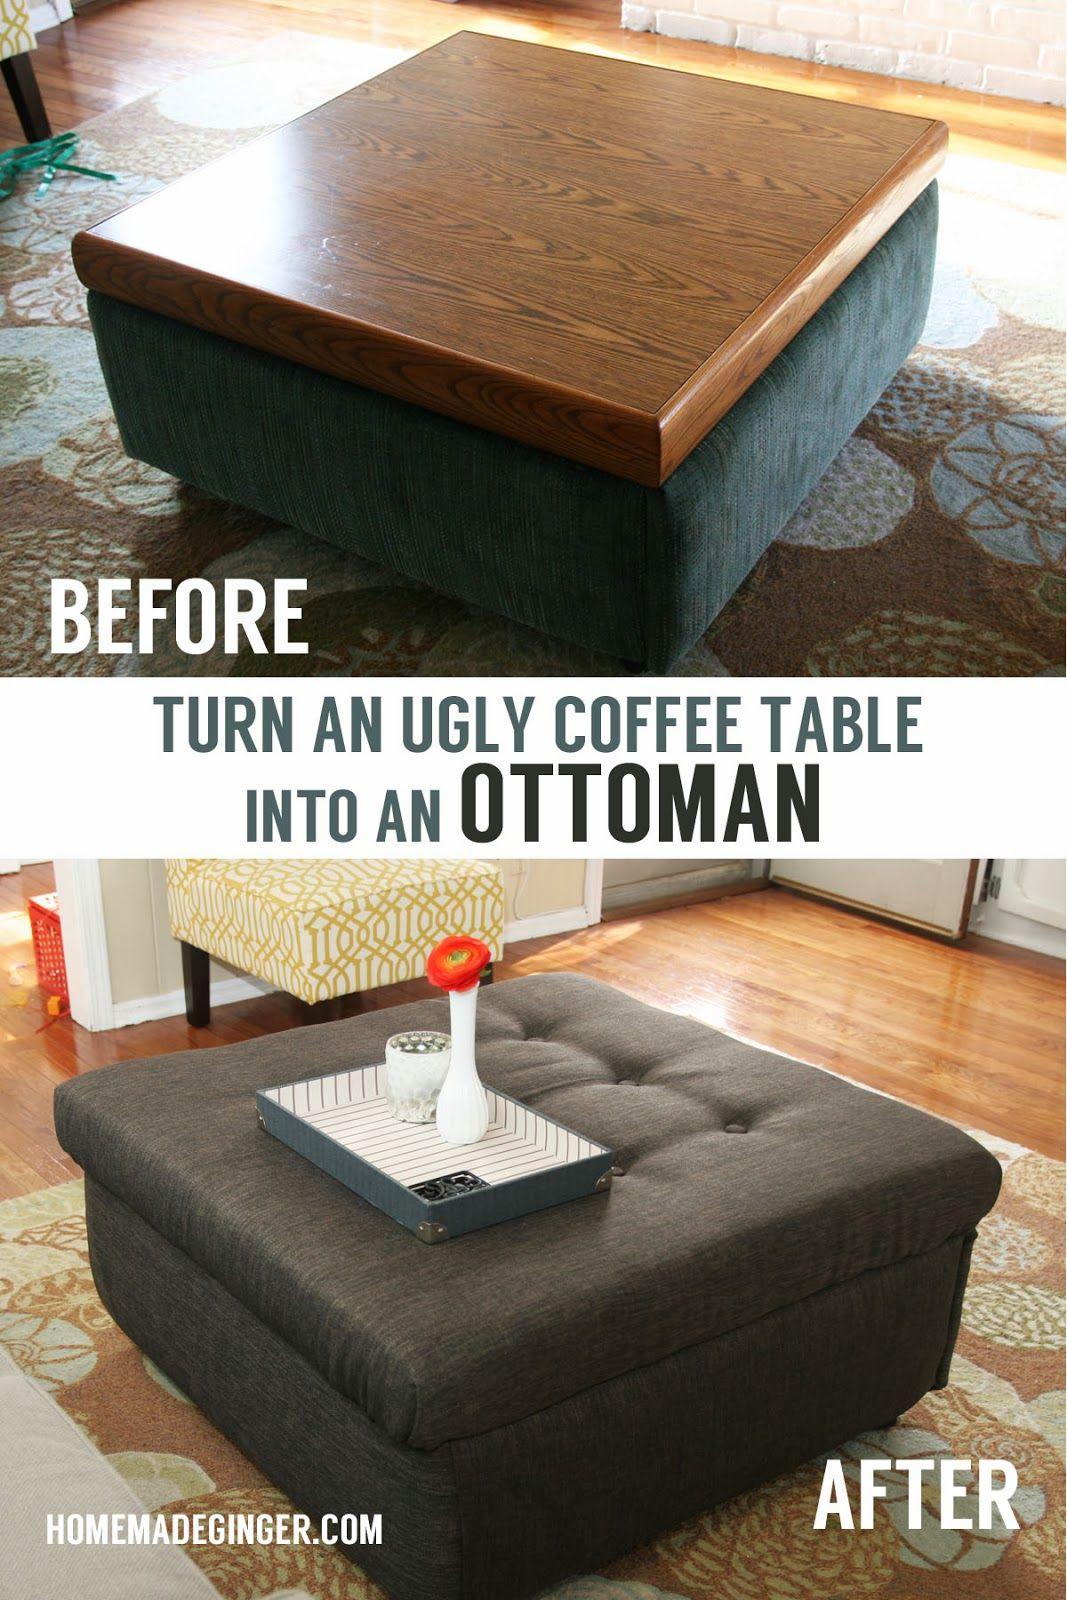 Turn an Ugly Coffee Table into an Ottoman